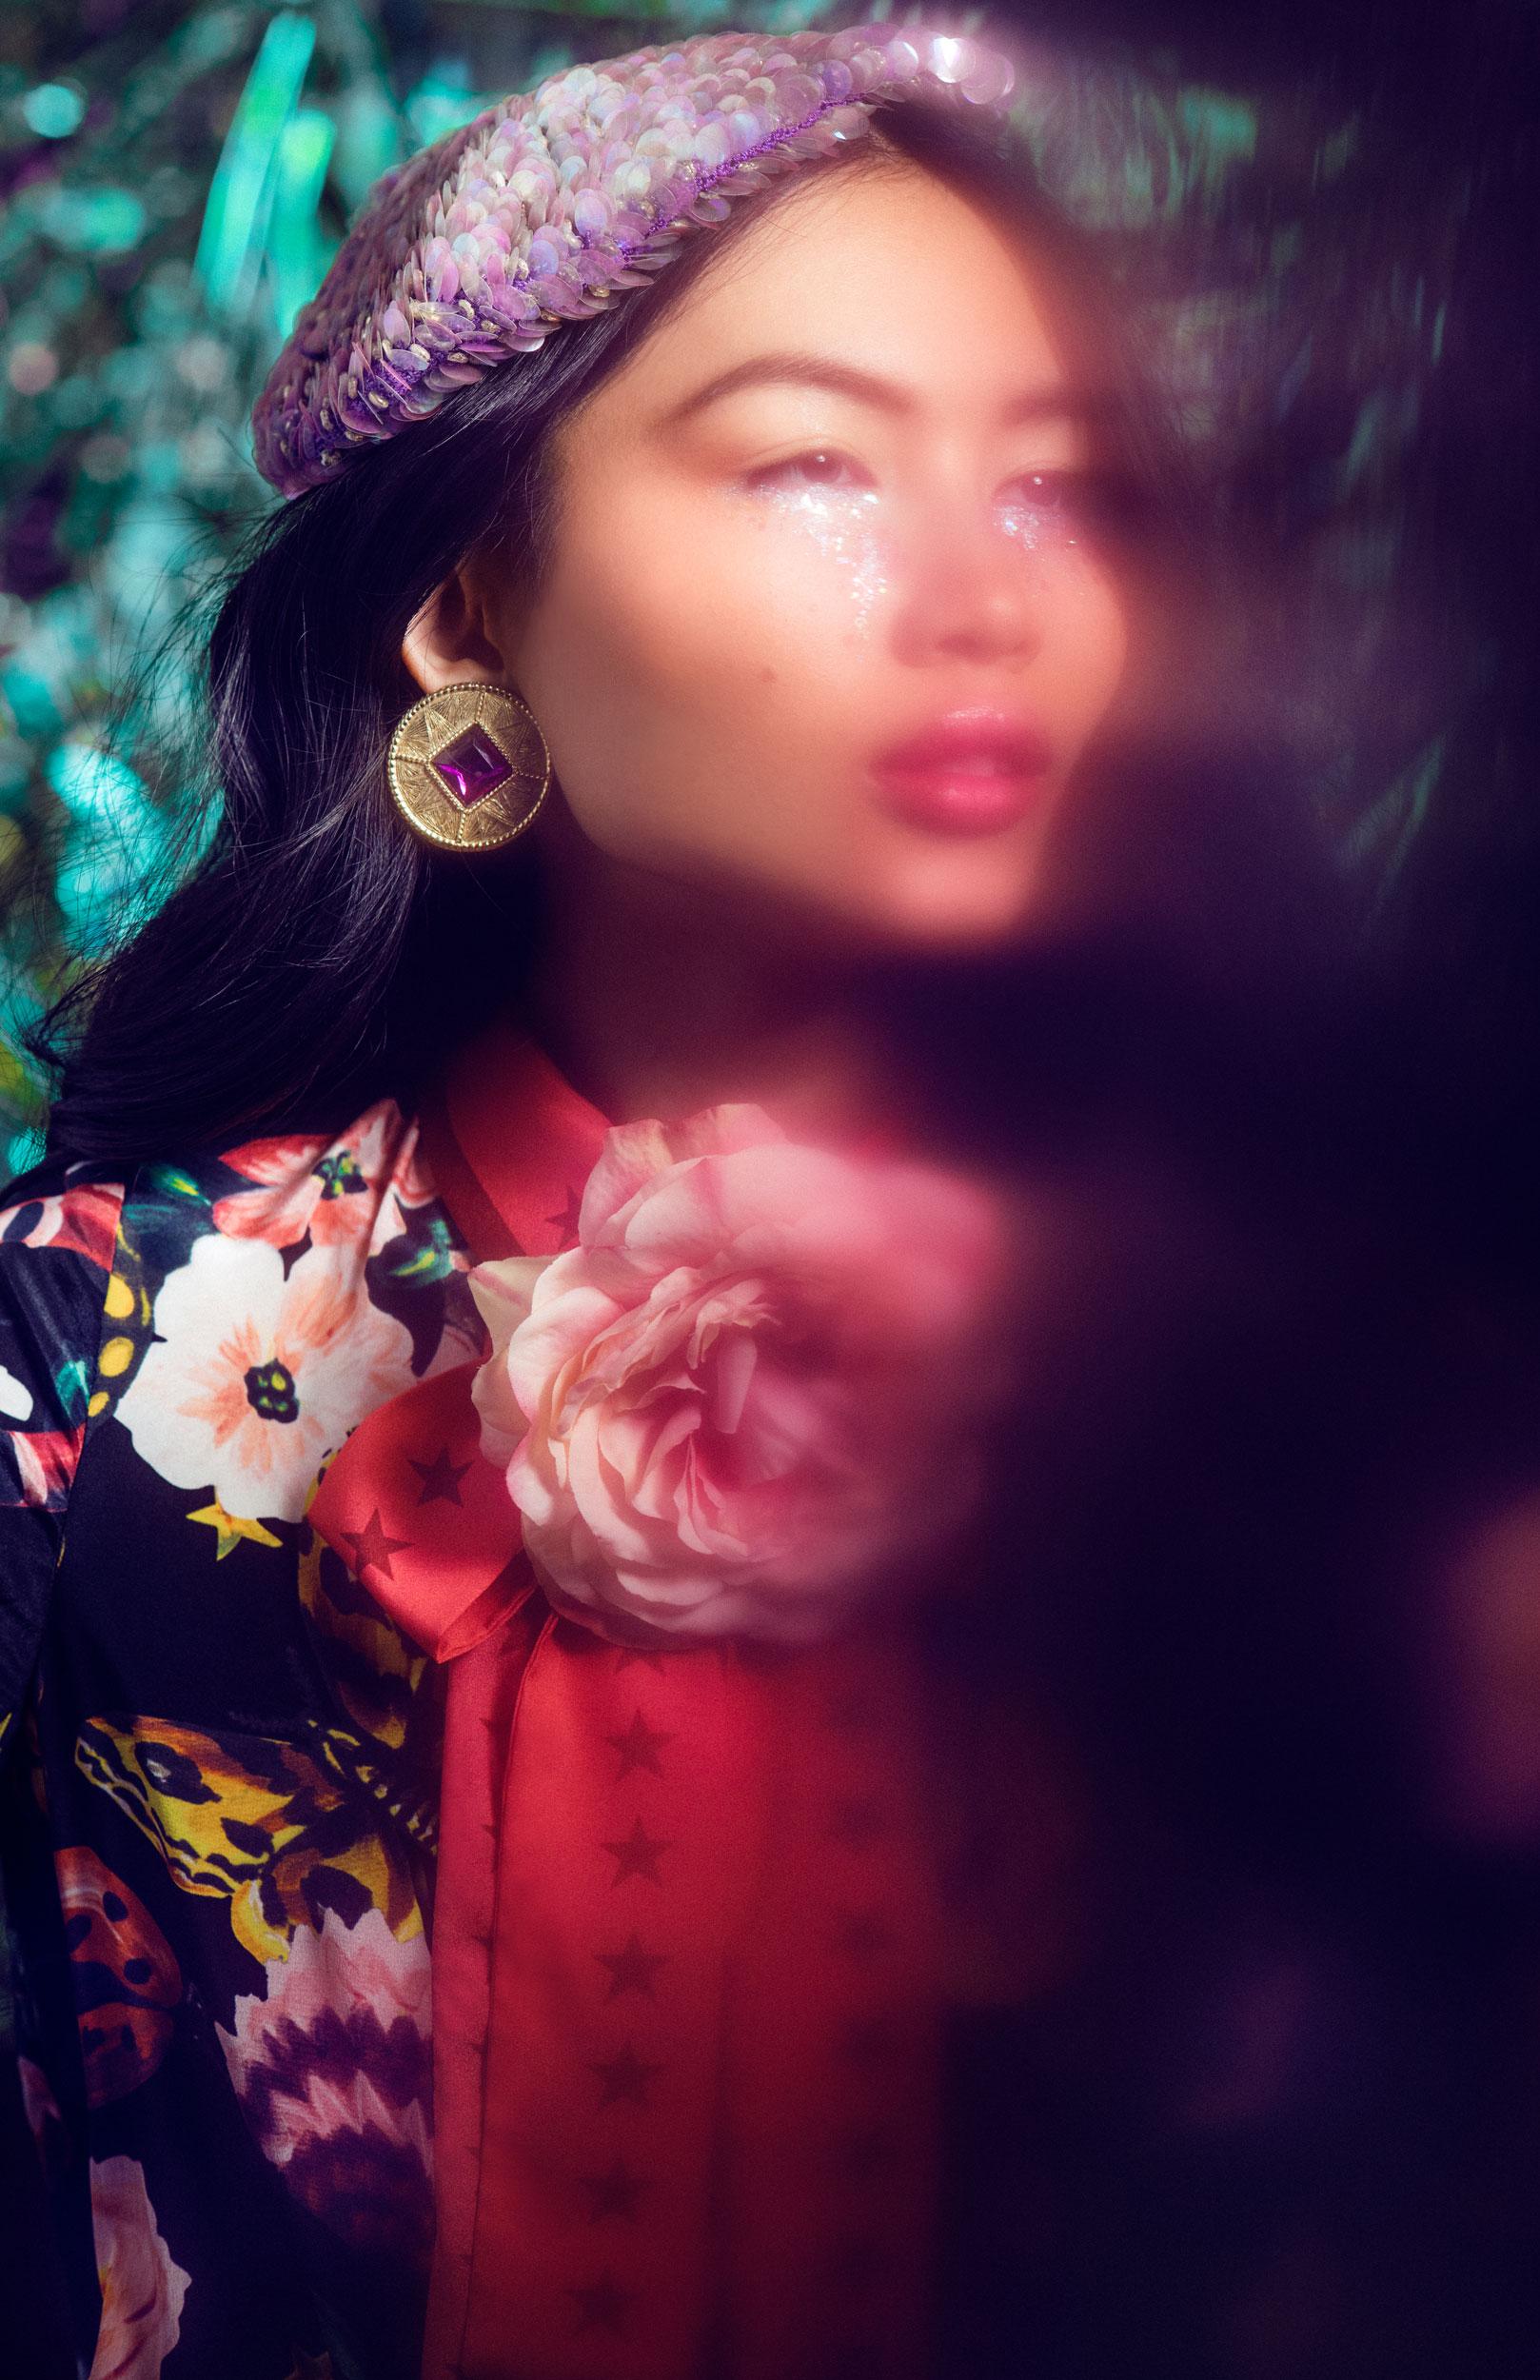 Augusta_Sagnelli_Glitter_Beauty_Editorial-6